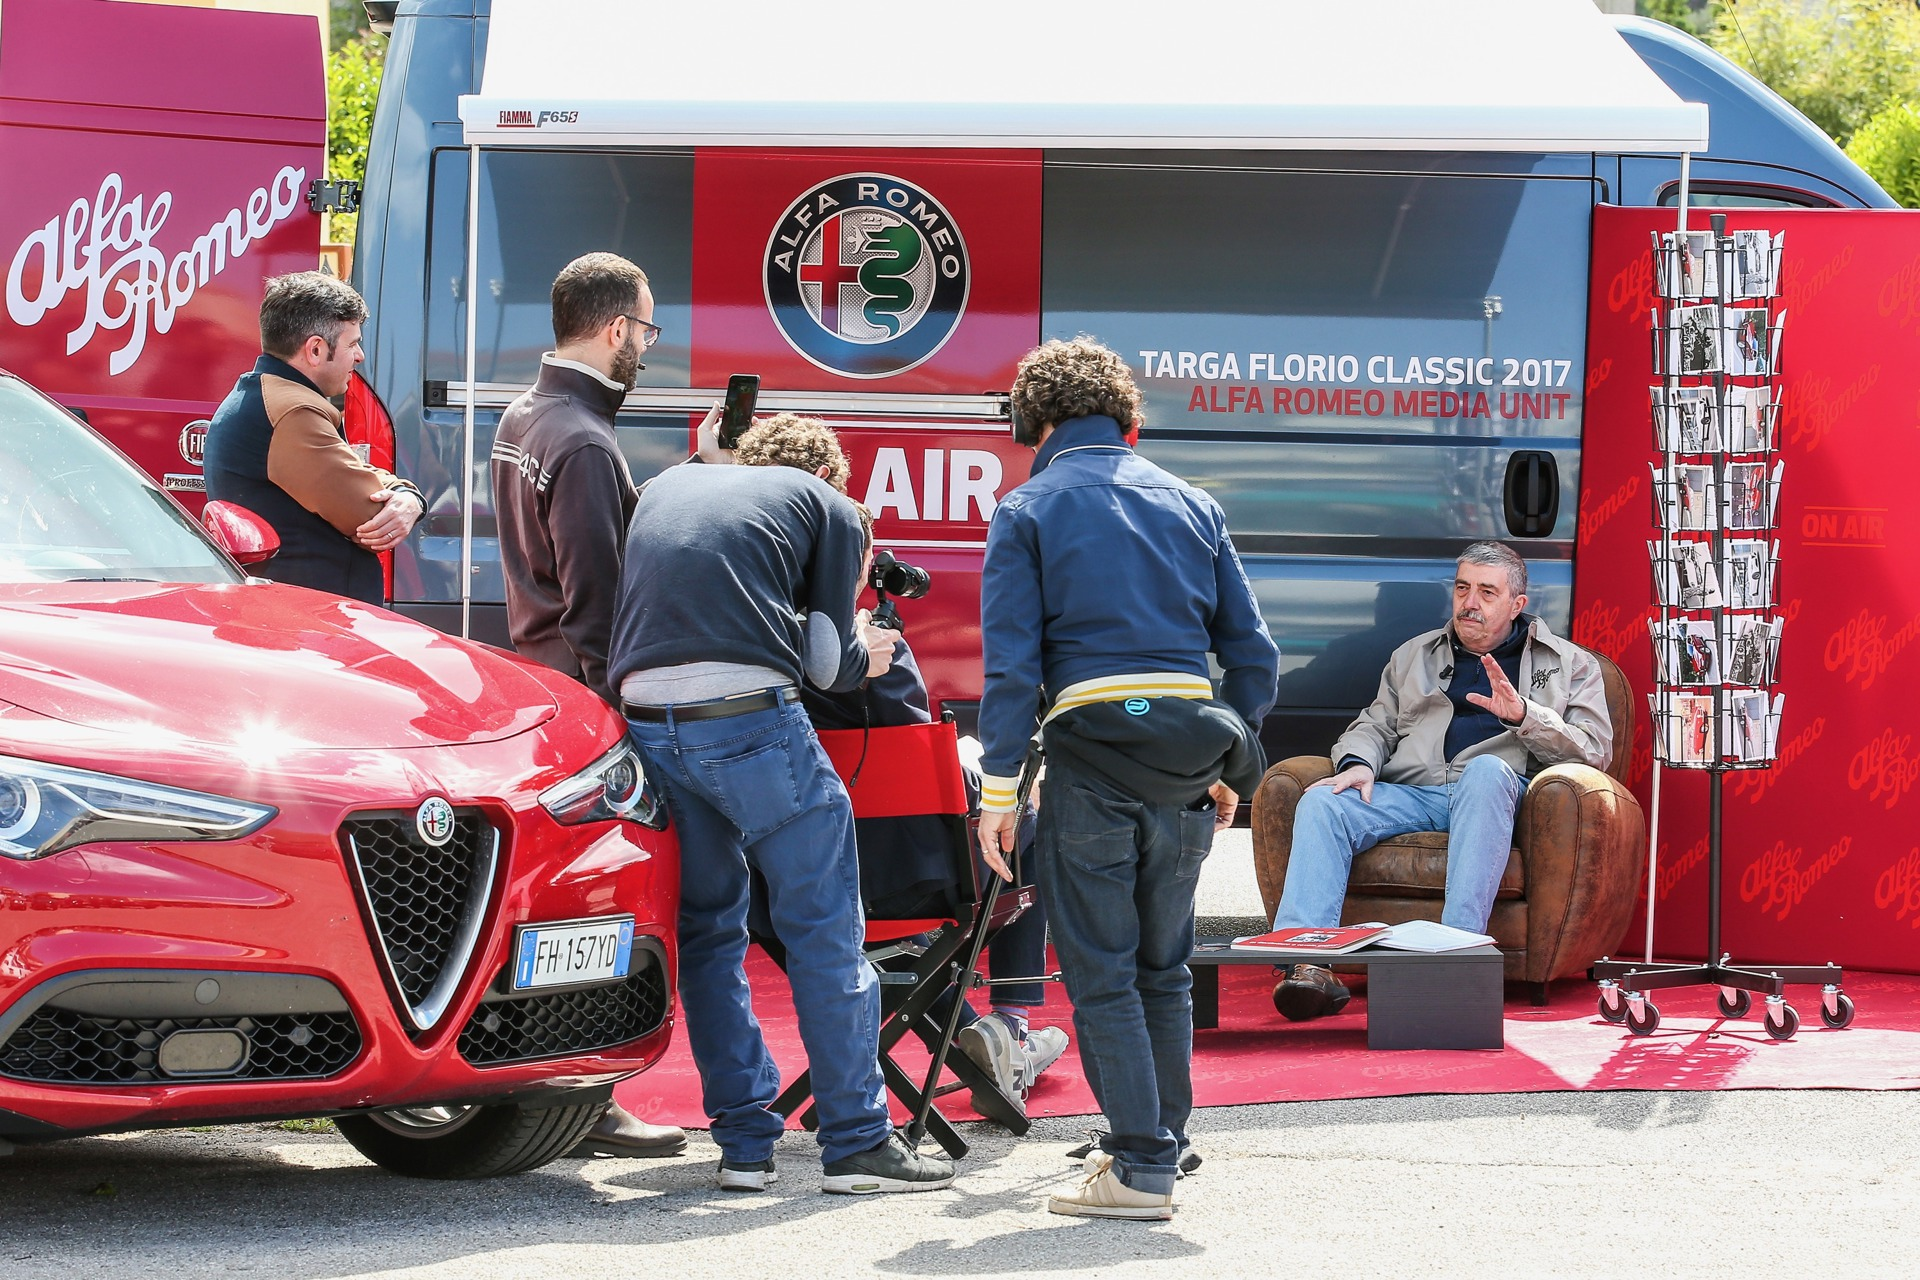 170422_Alfa-Romeo_On-Air_08.jpg